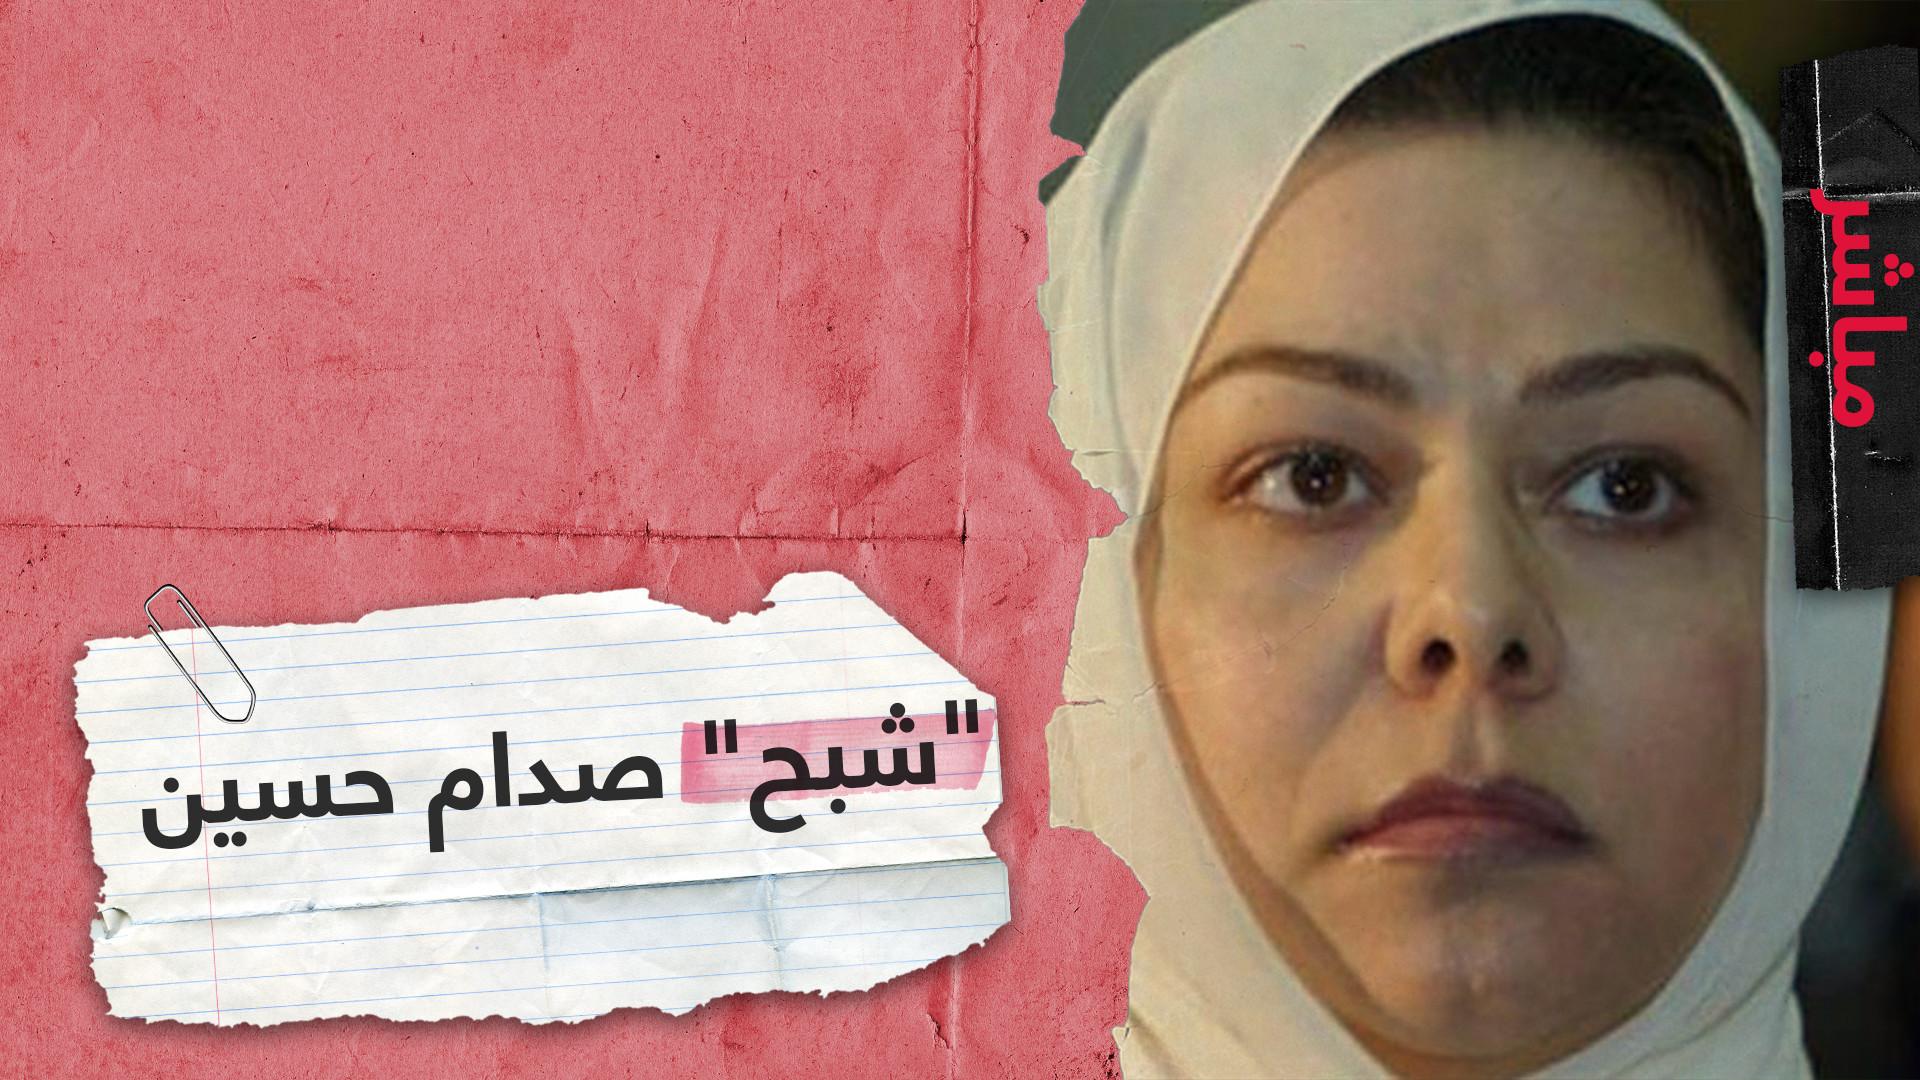 """شبح"" صدام حسين.. برلمانيون عراقيون يريدون تسليم ابنته رغد إلى بغداد"